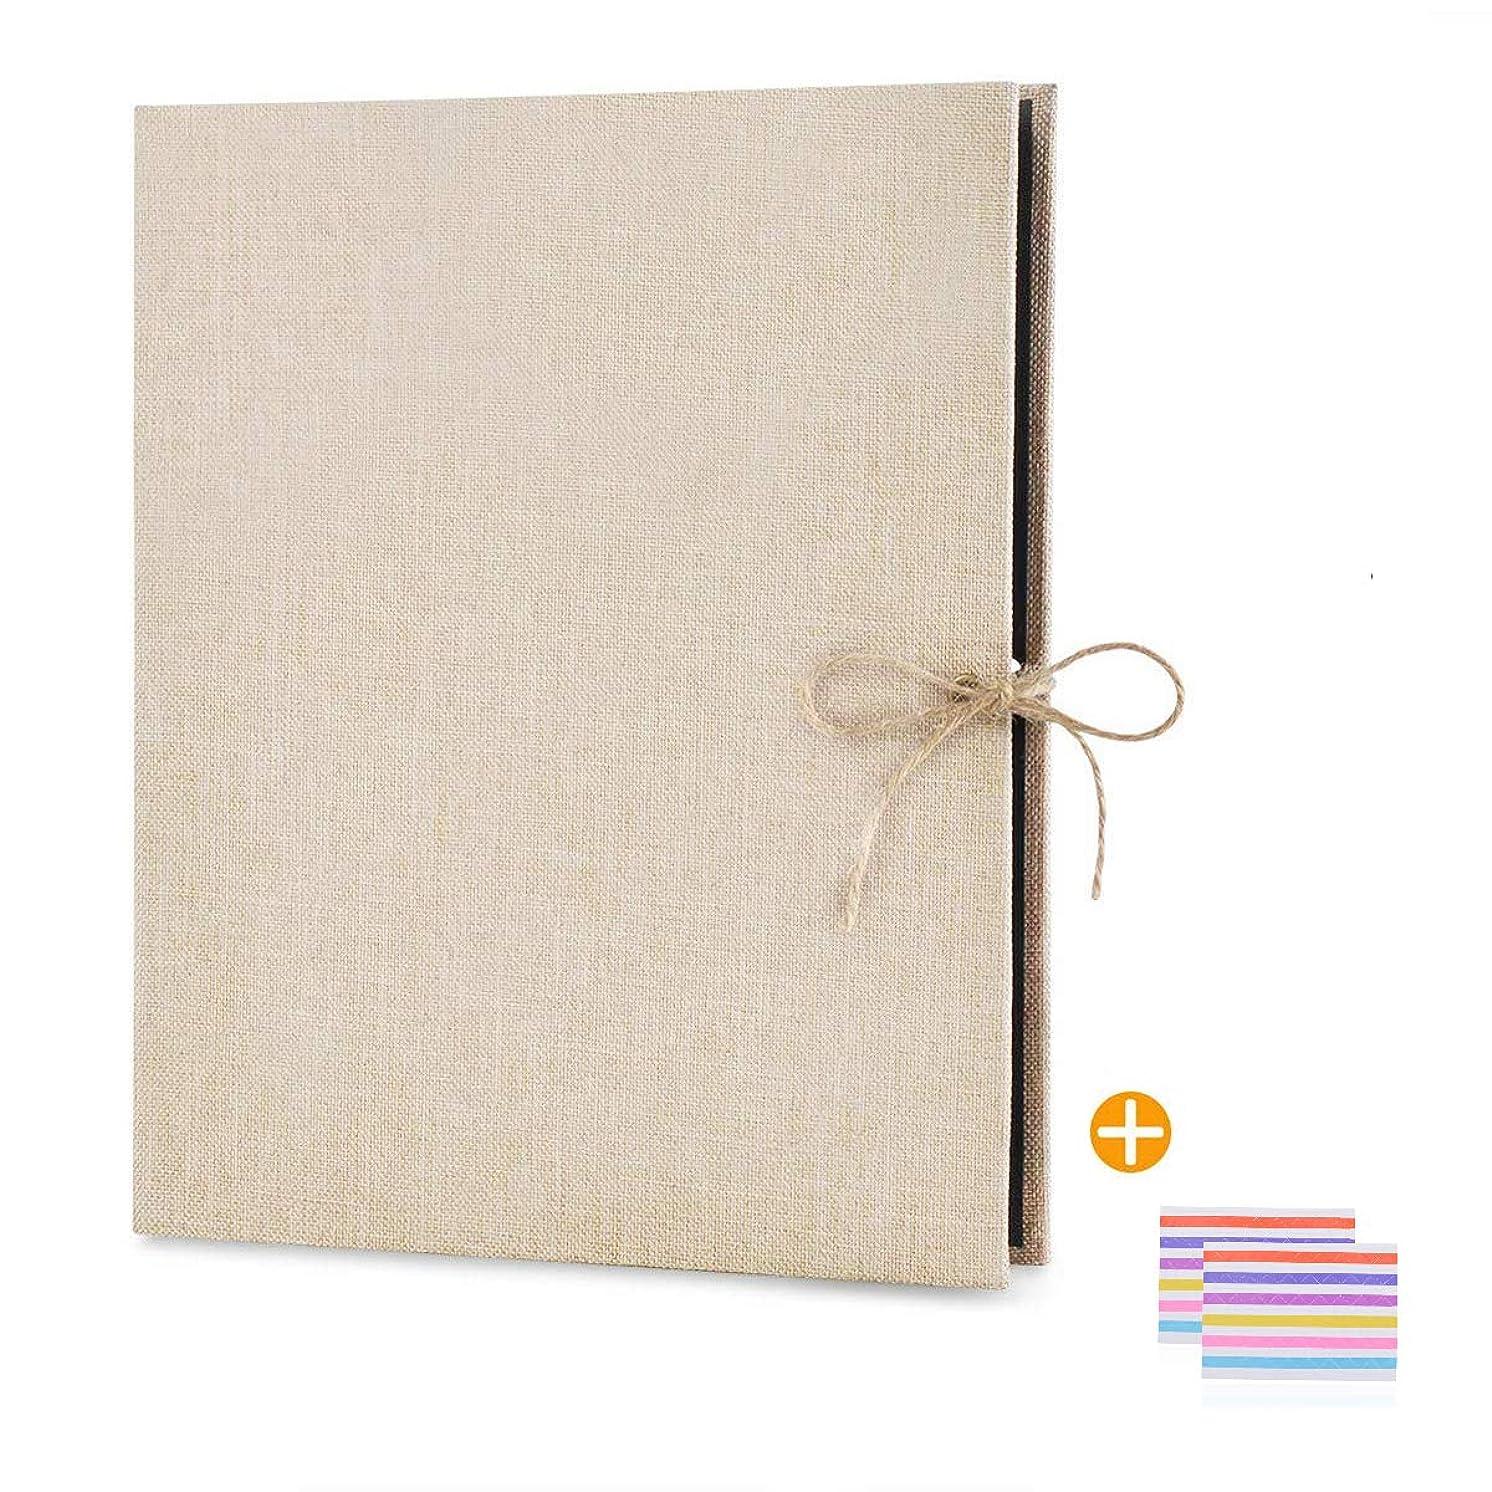 EKKONG Photo Album Scrapbook, 60 Pages Photo Album,10.4 x 8.3 inch Vintage Black Pages Memory Book,Wedding Photo Album,Anniversary Scrapbook,Travel Album (Beige)